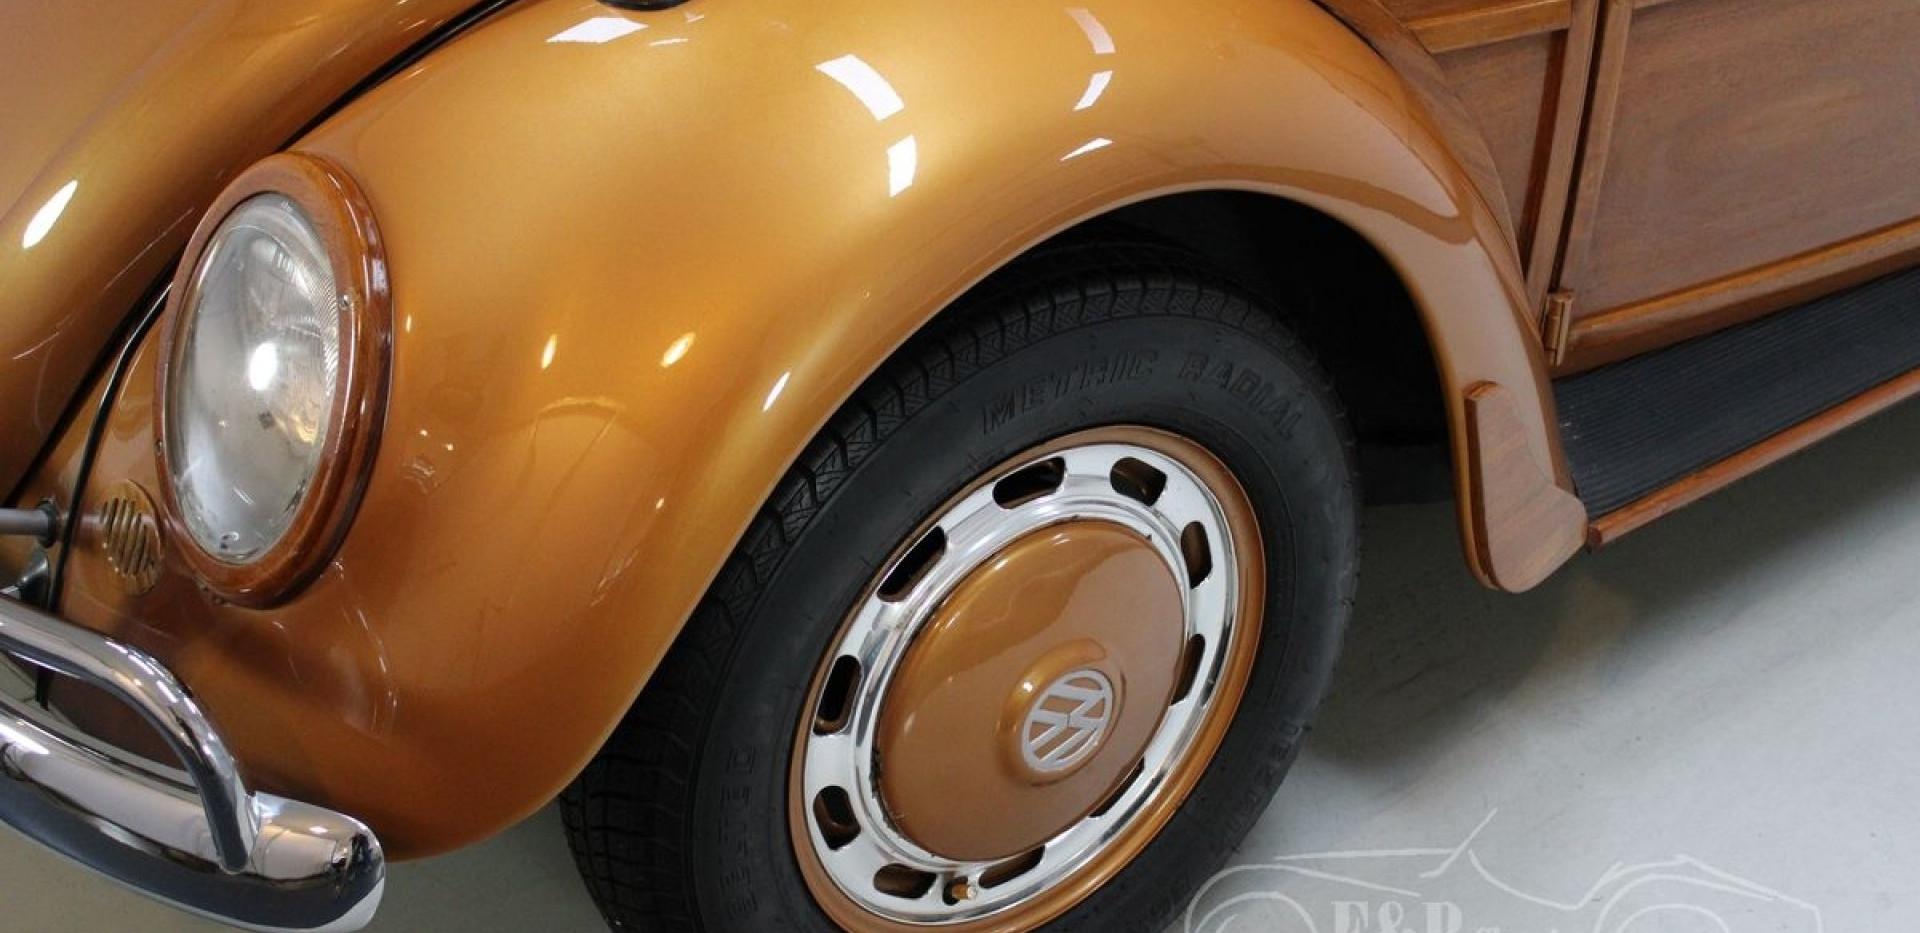 volkswagen-kever-woody-1966-v1273-053.jp